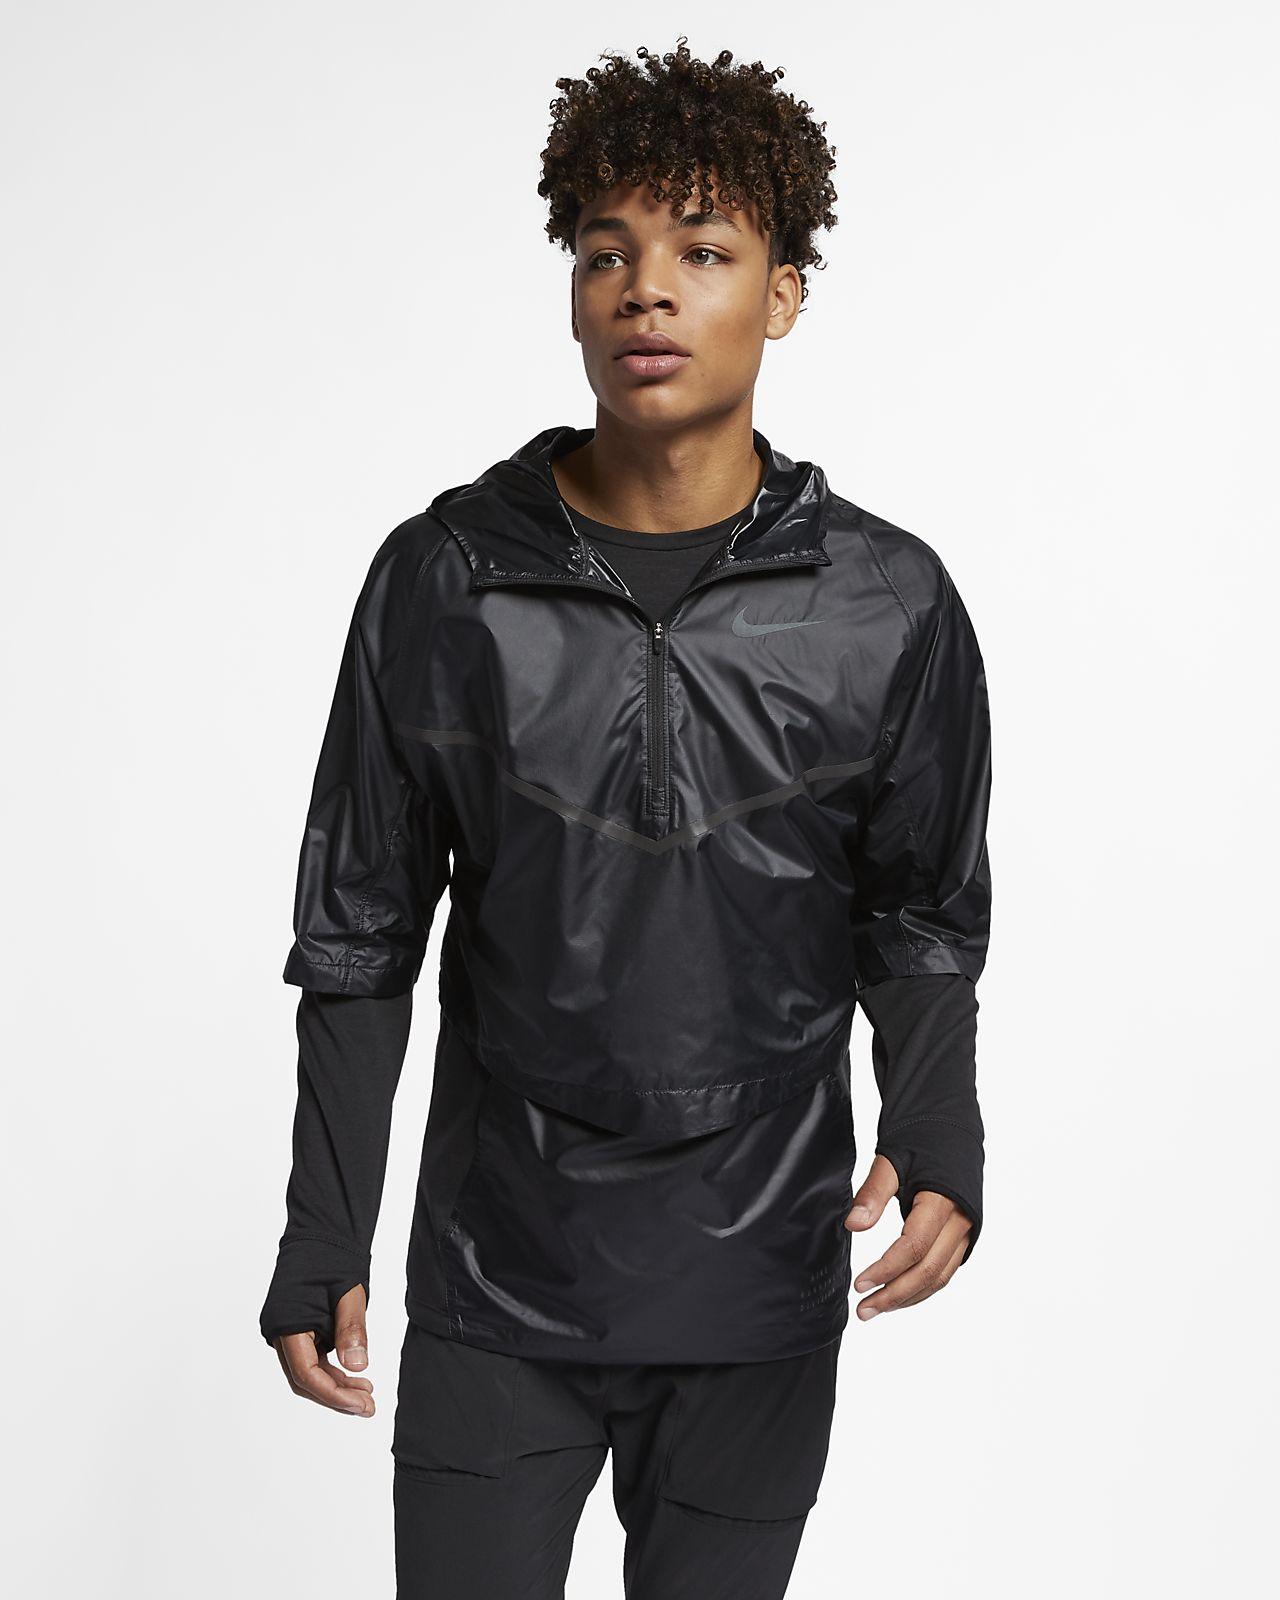 Nike Sphere Transform férfi futófelső